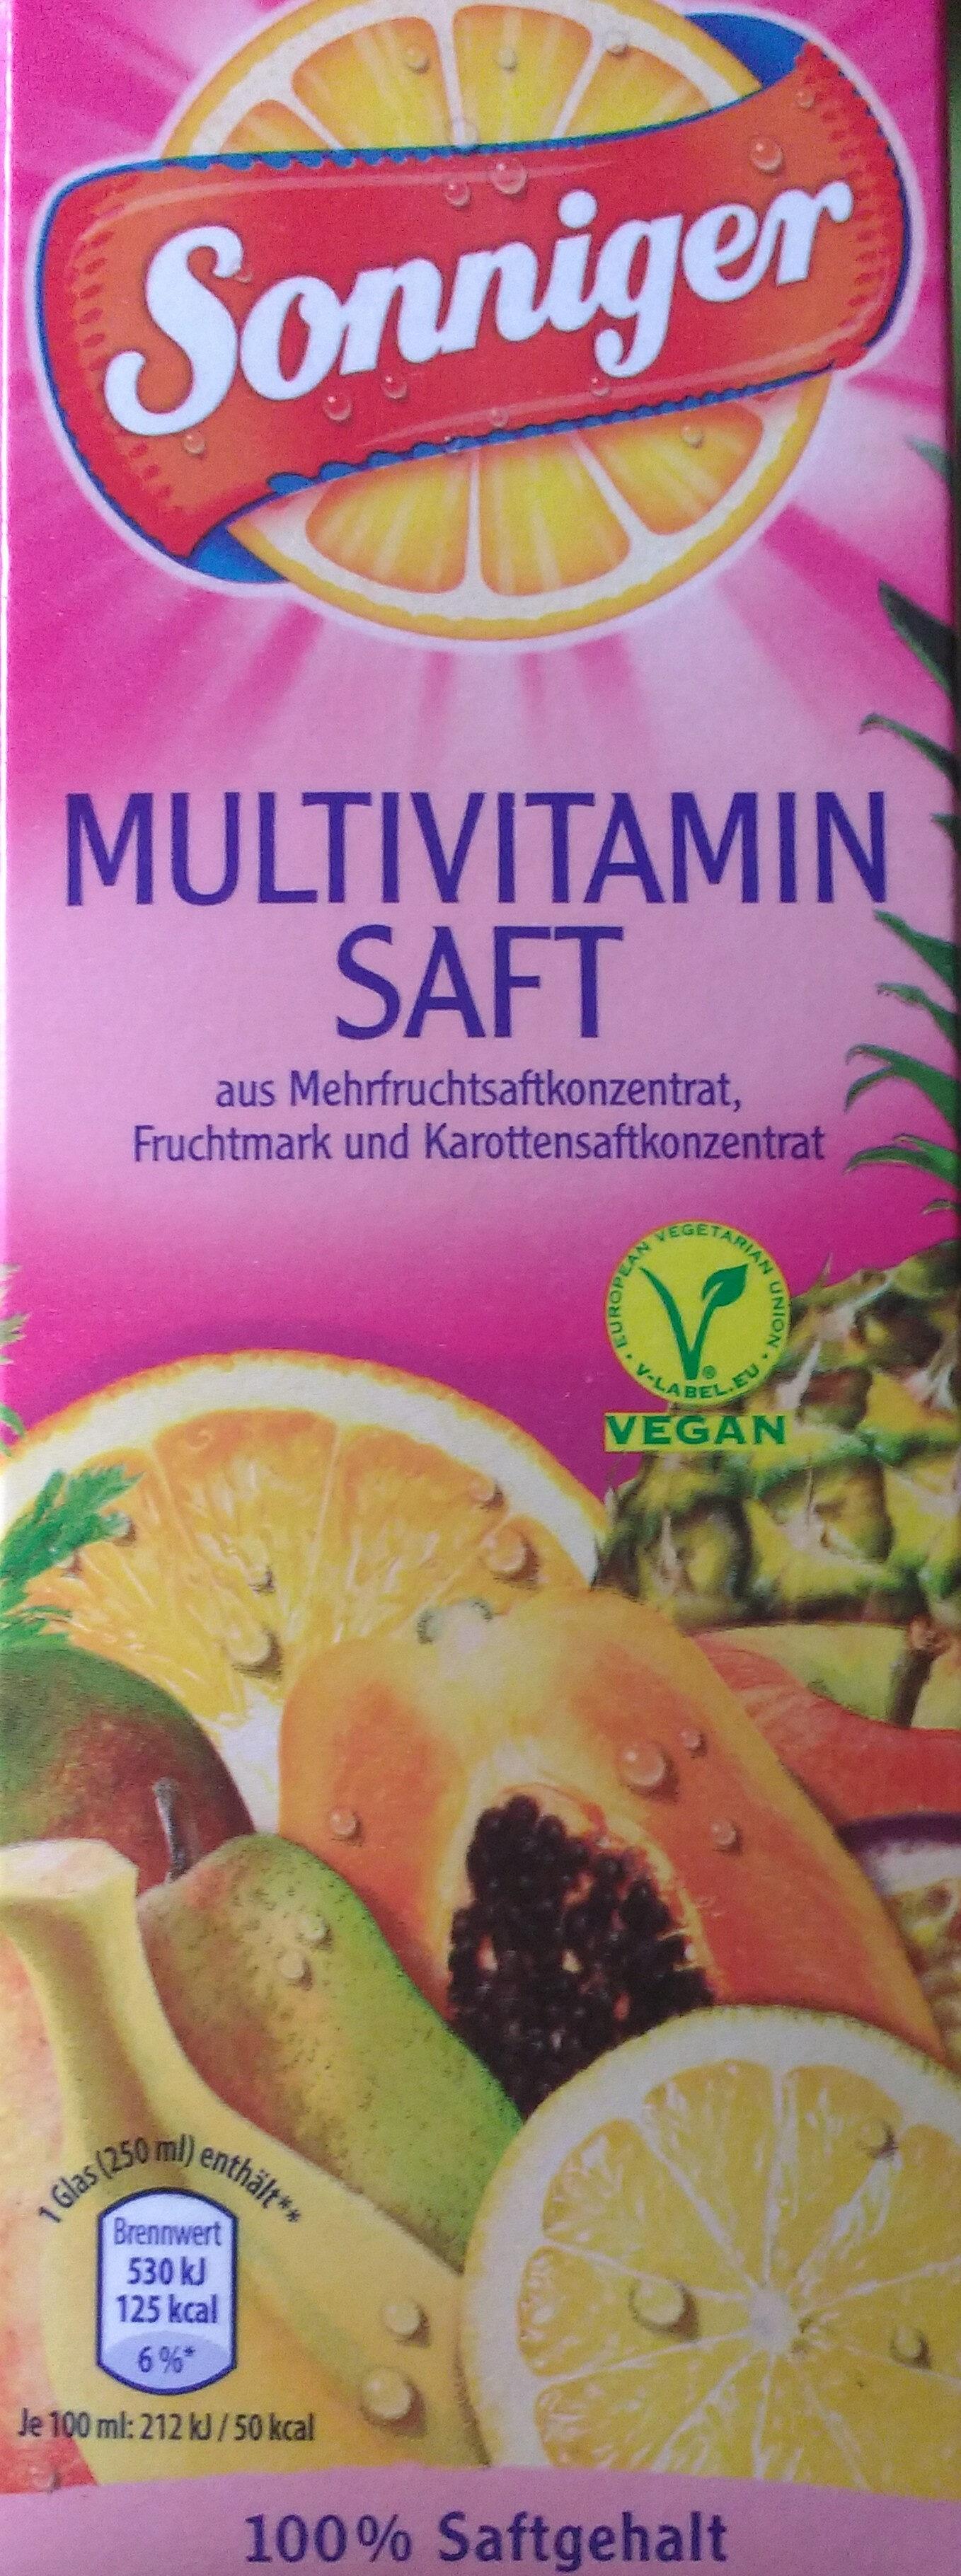 Multifruchtsaft - Product - de